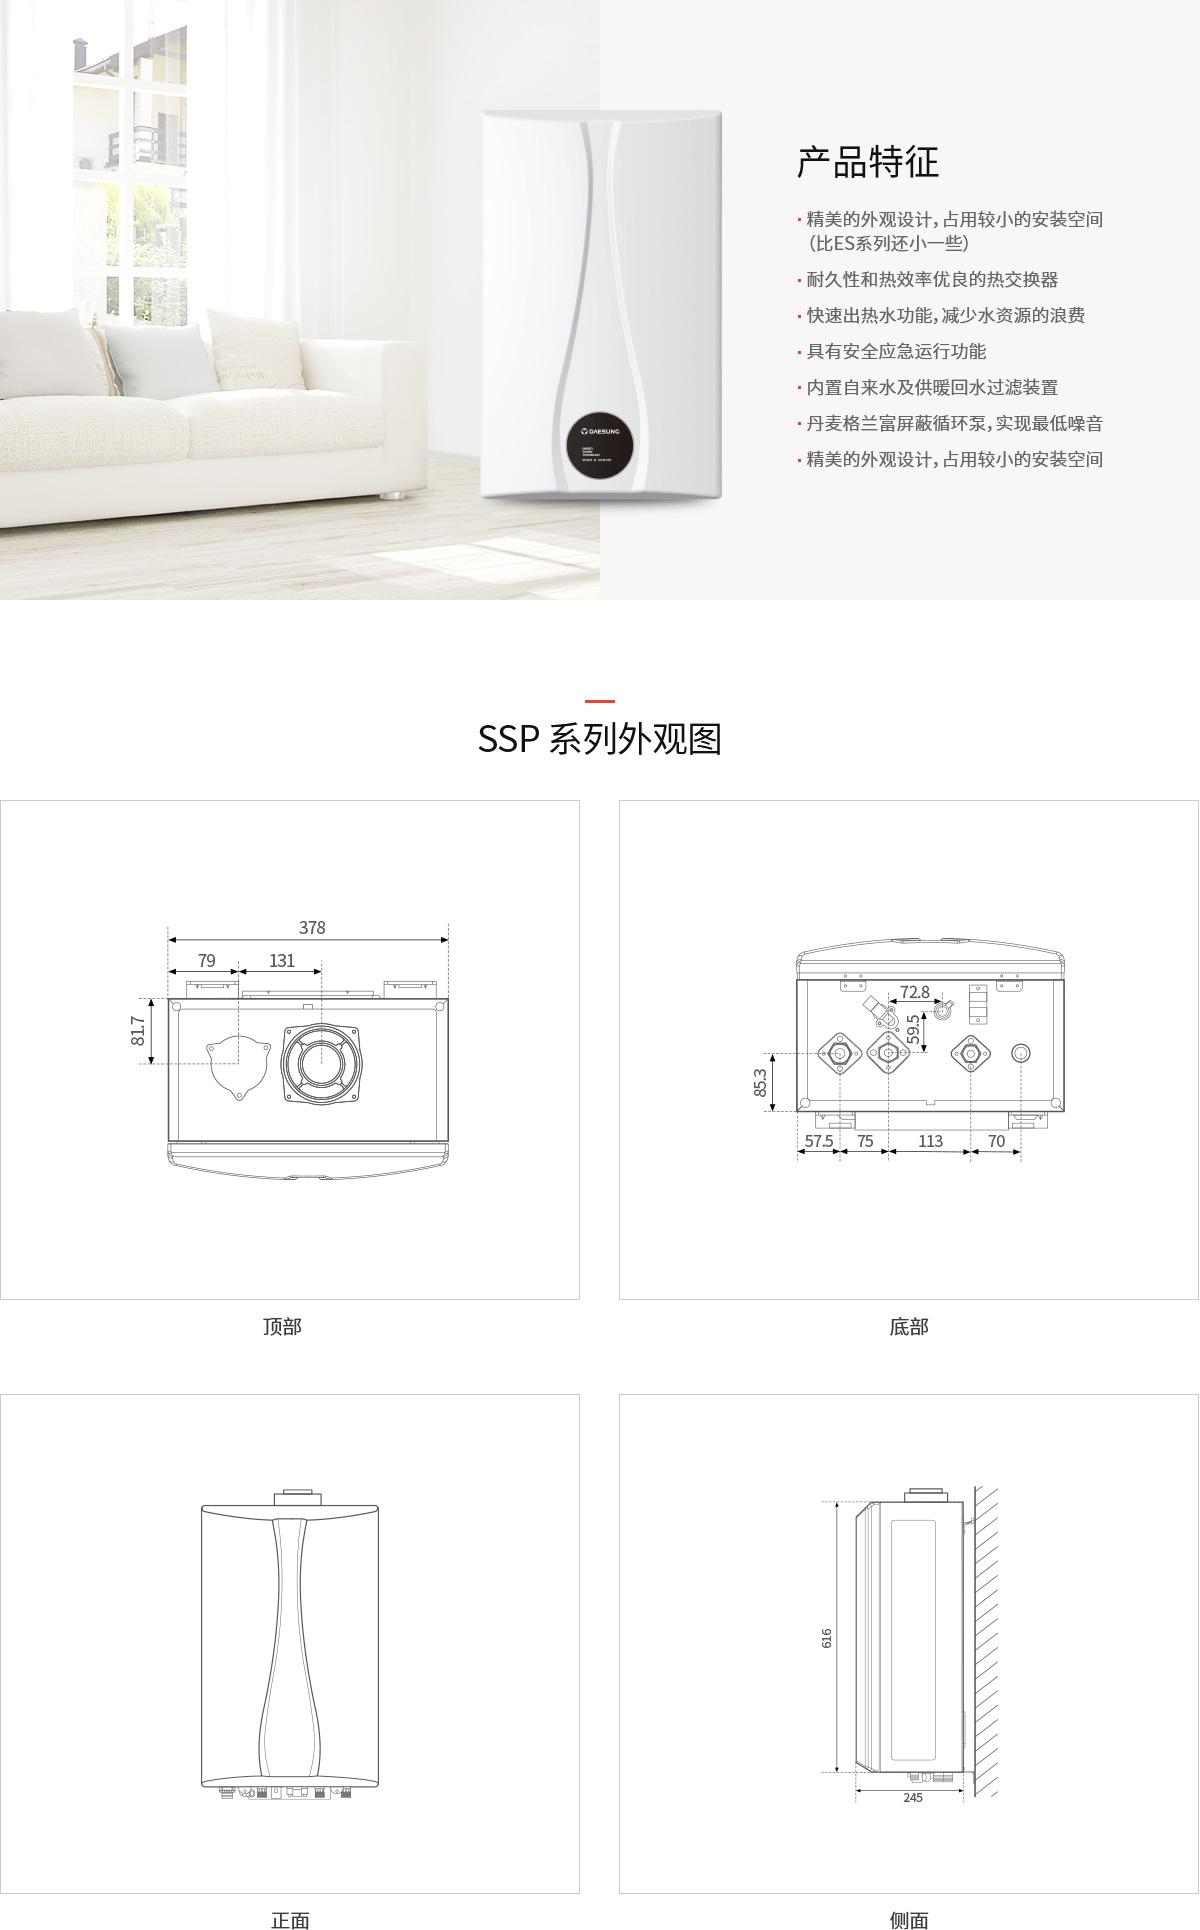 SSP_detail.jpg